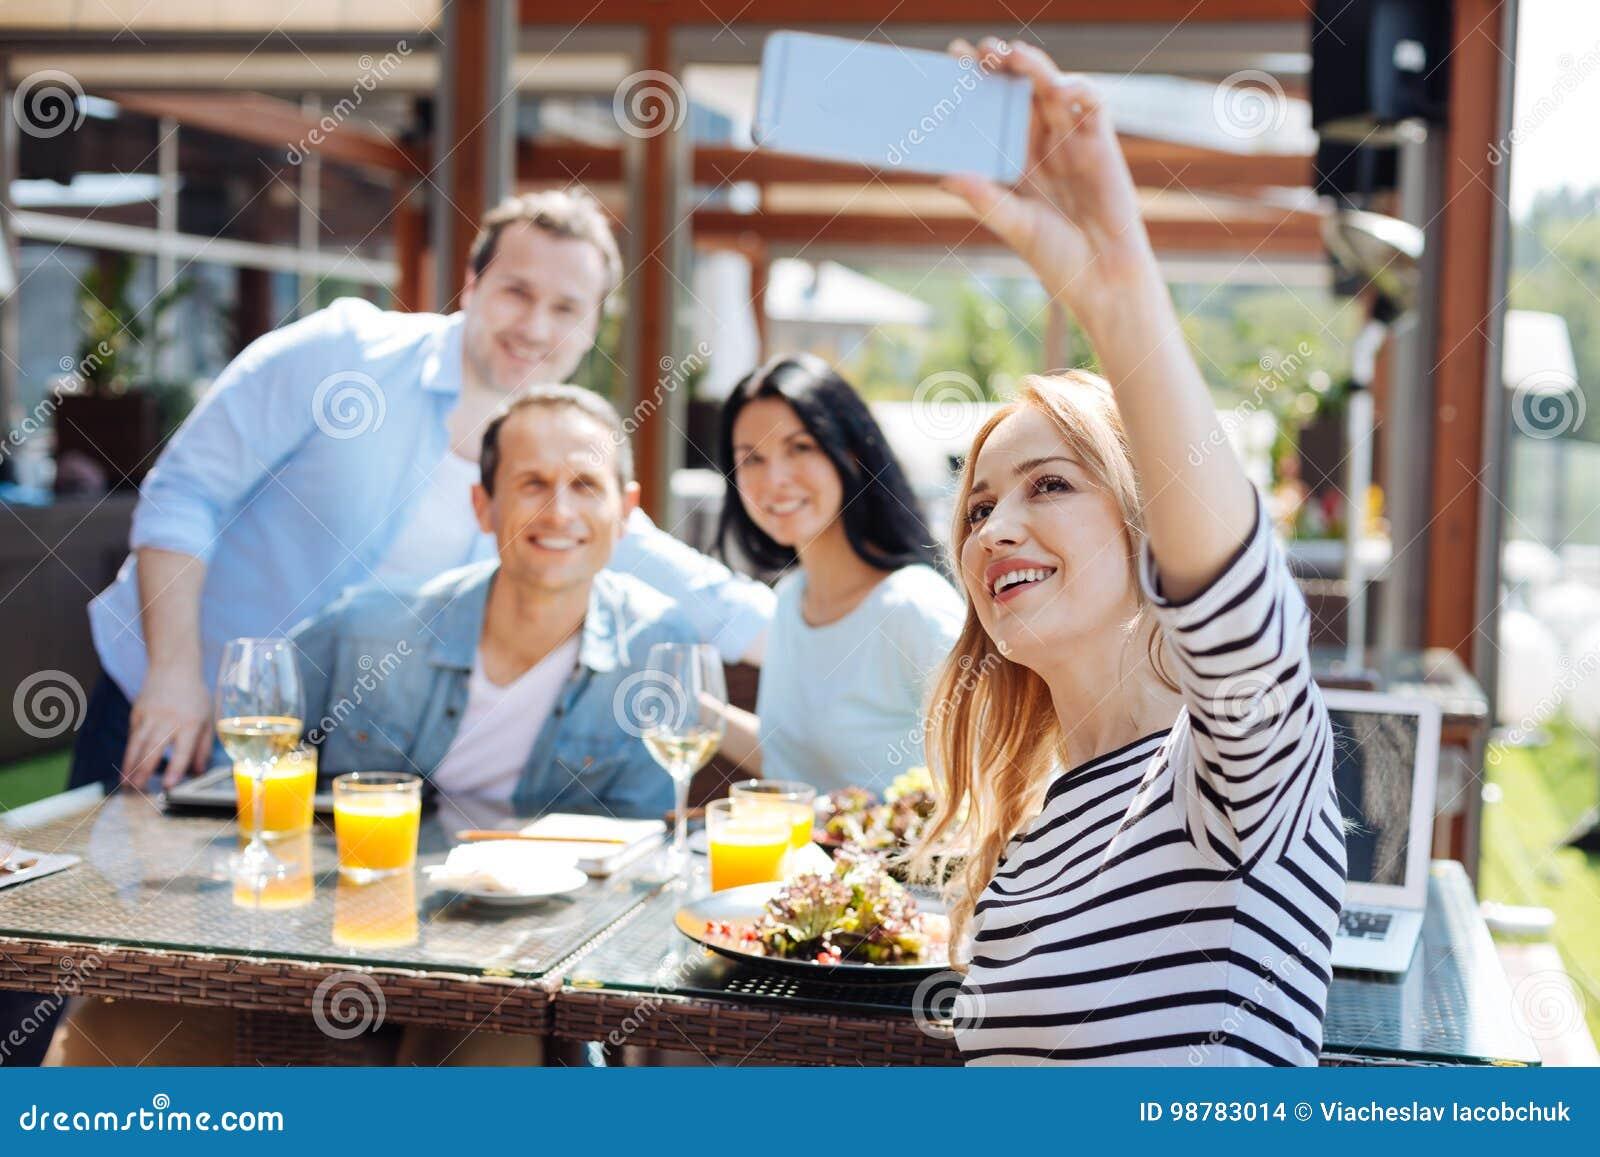 Joyful nice woman taking a photo of her friends